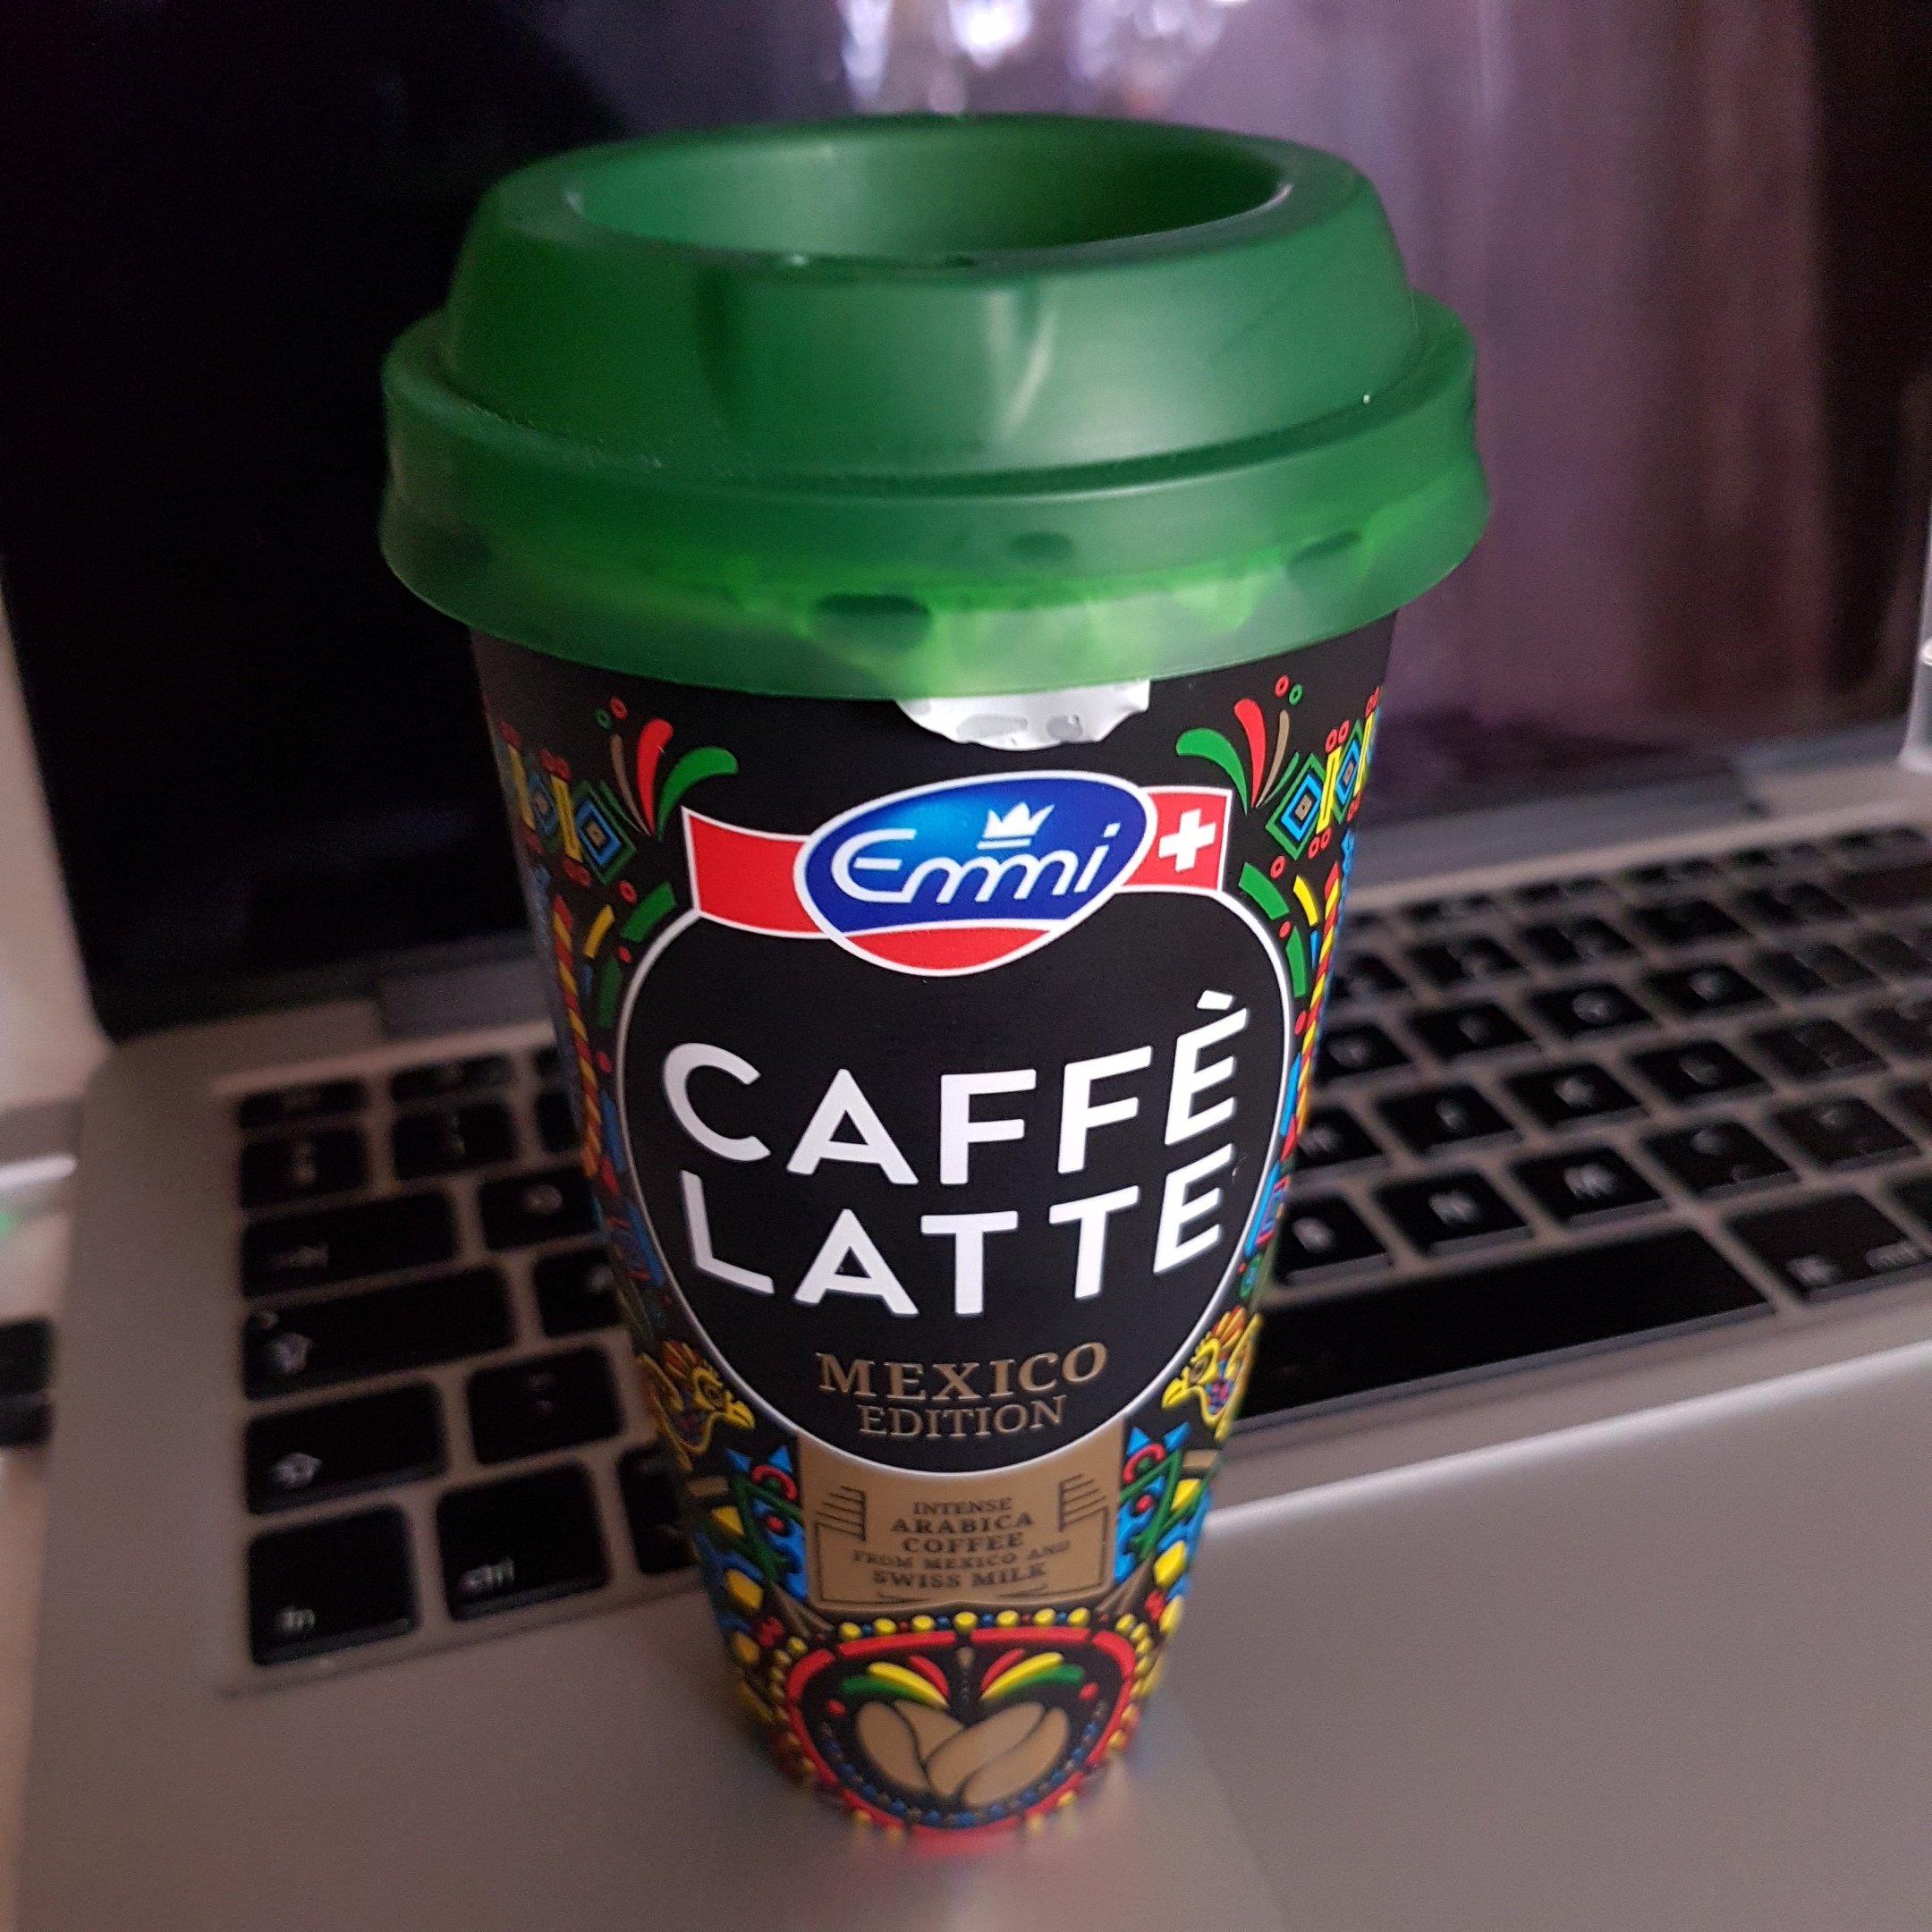 Emmi Caffè Latte Mexico Edition - itstartswithacoffee.com #coffee #caffelatte #latte #EmmiCaffeLatte #arabicacoffee #itstartswithacoffee.com